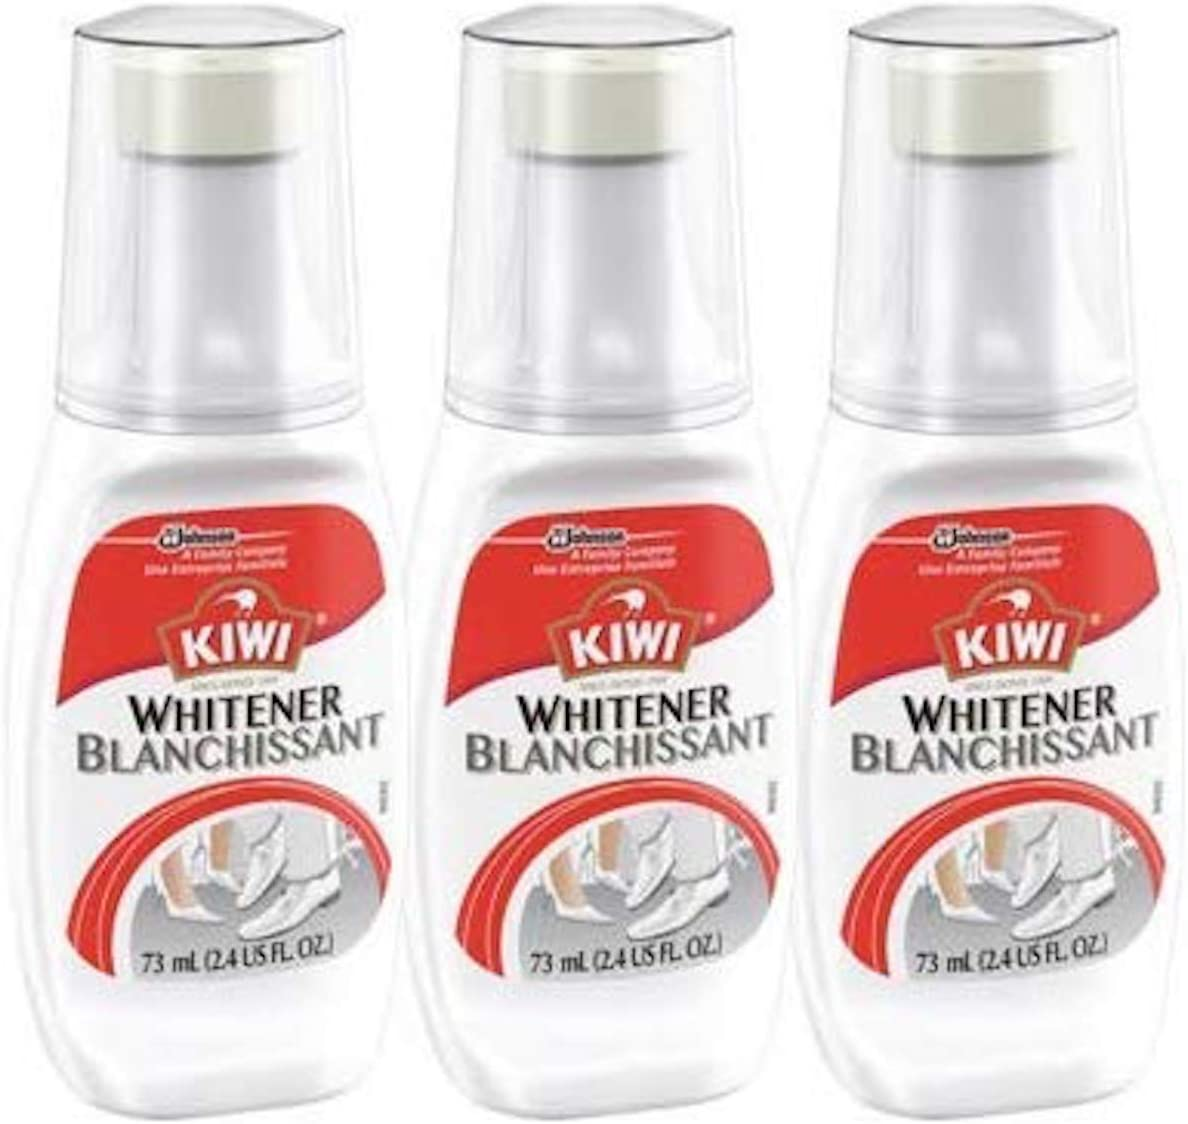 Amazon.com: Kiwi White Shoe Cleaner